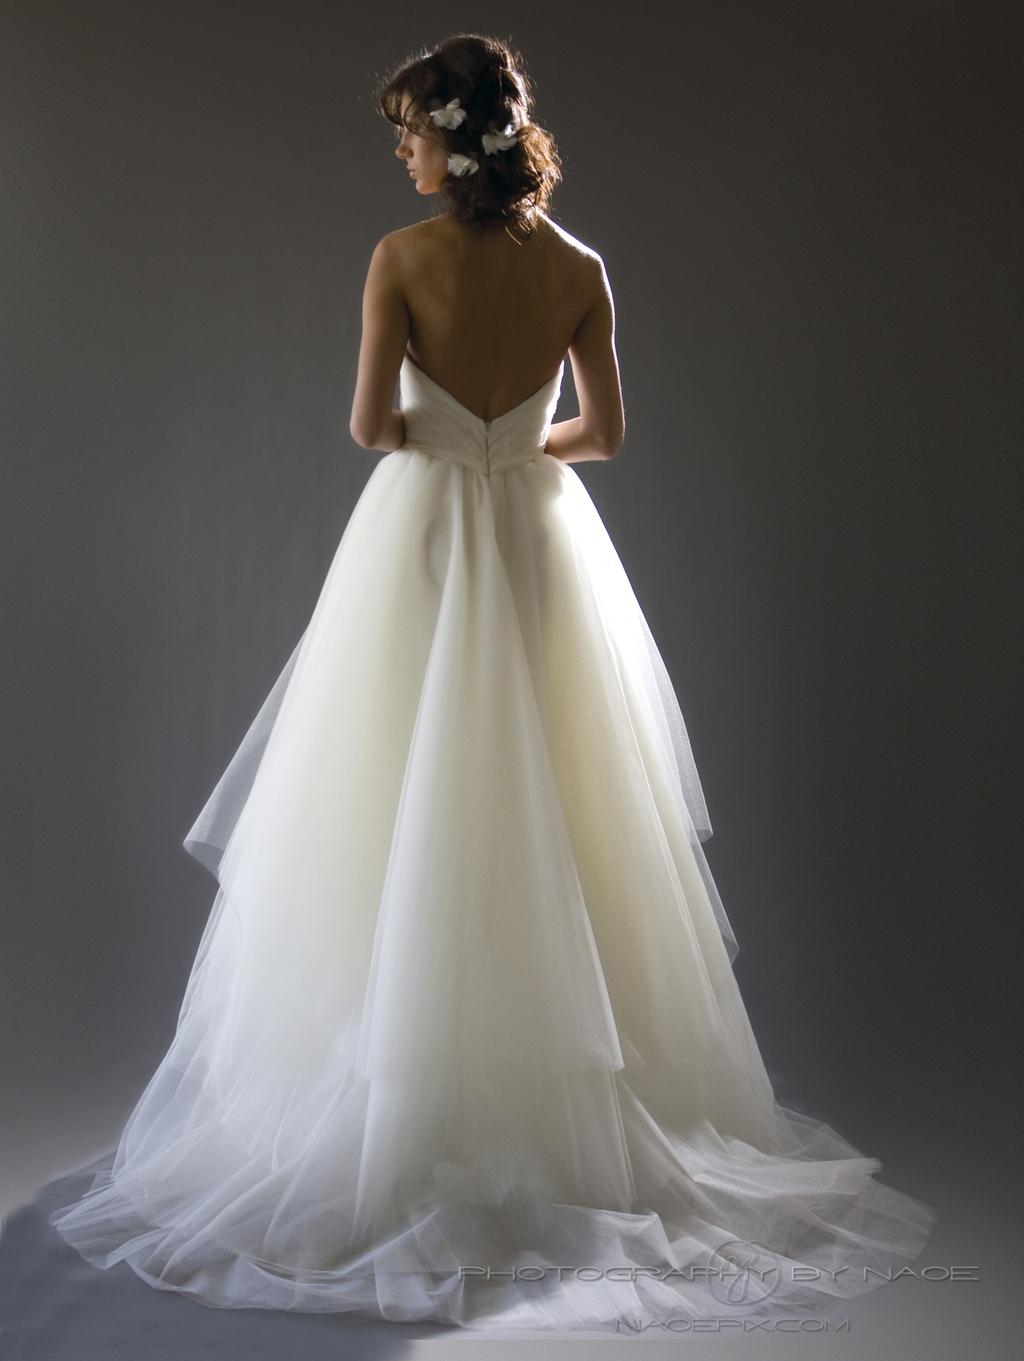 Wedding-dress-spring-2013-bridal_gown-cocoe-voci-3-back.full